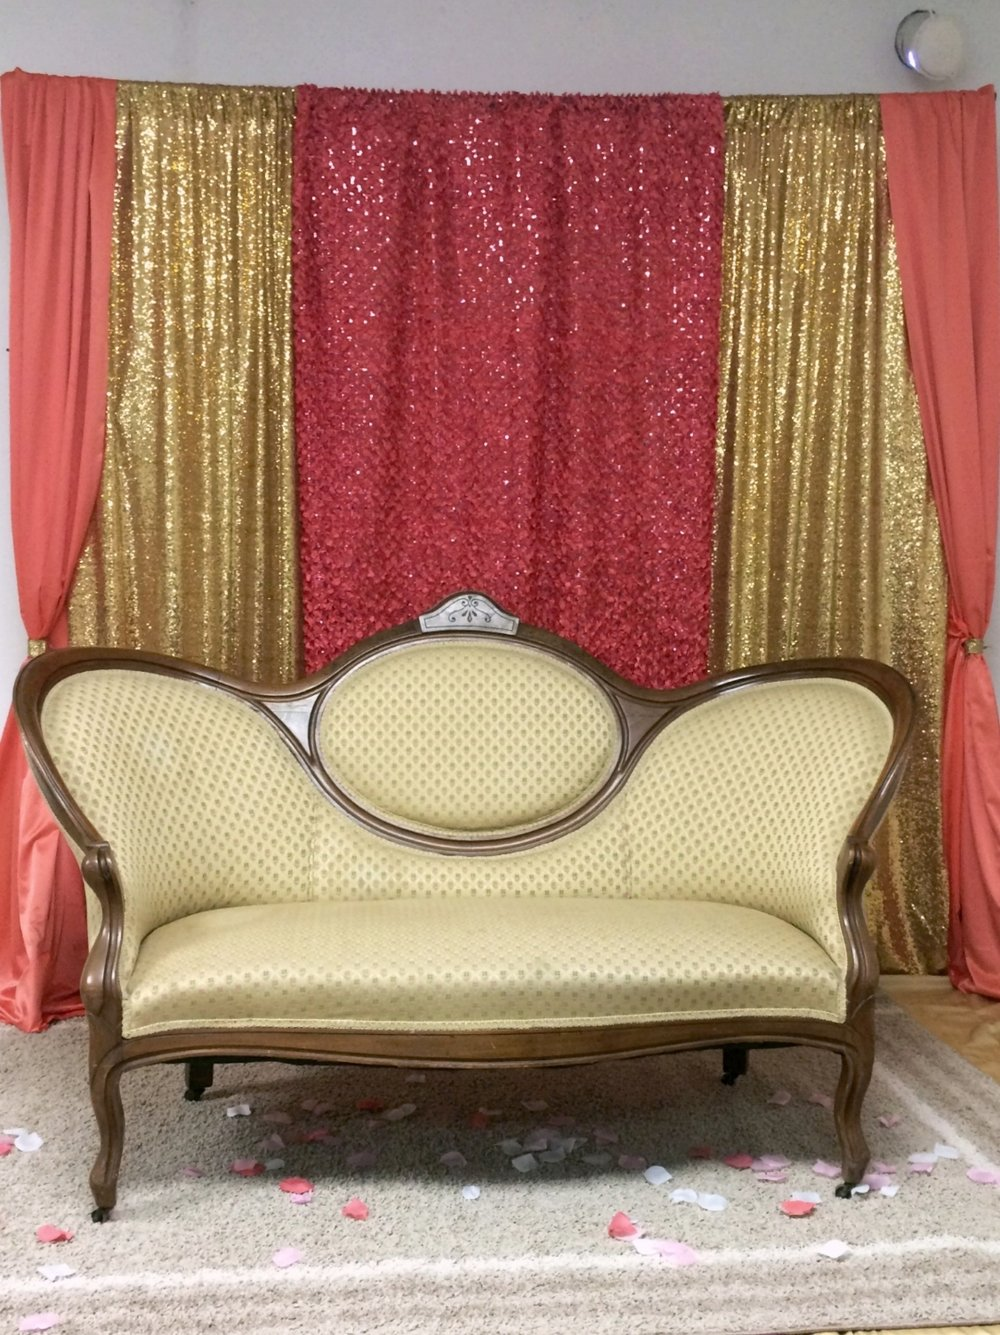 Vintage Love Seat - Settee rentals